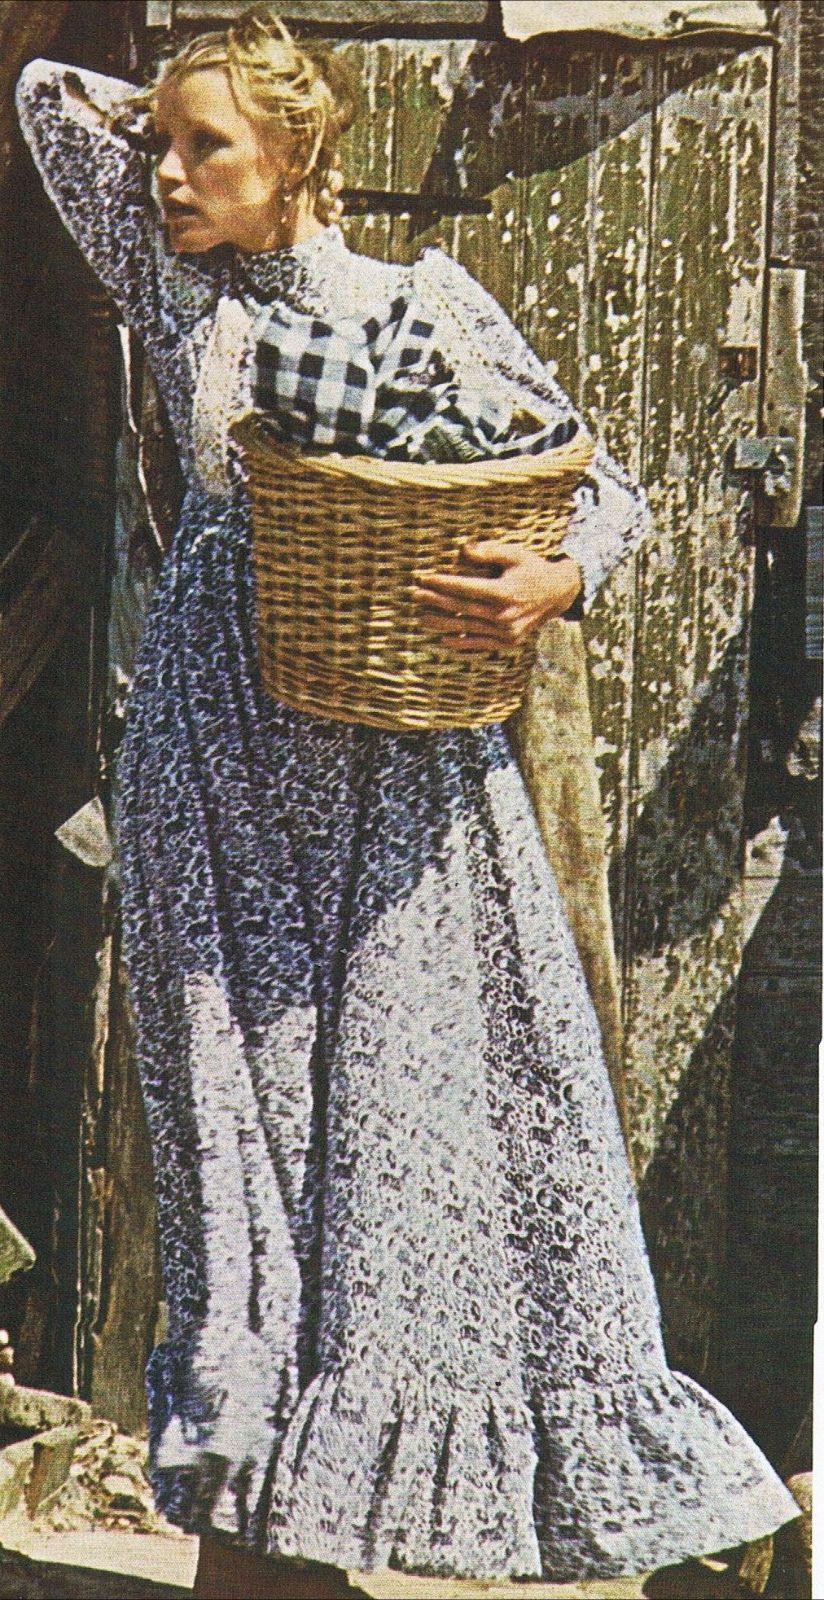 Vintage 70s Laura Ashley Dress